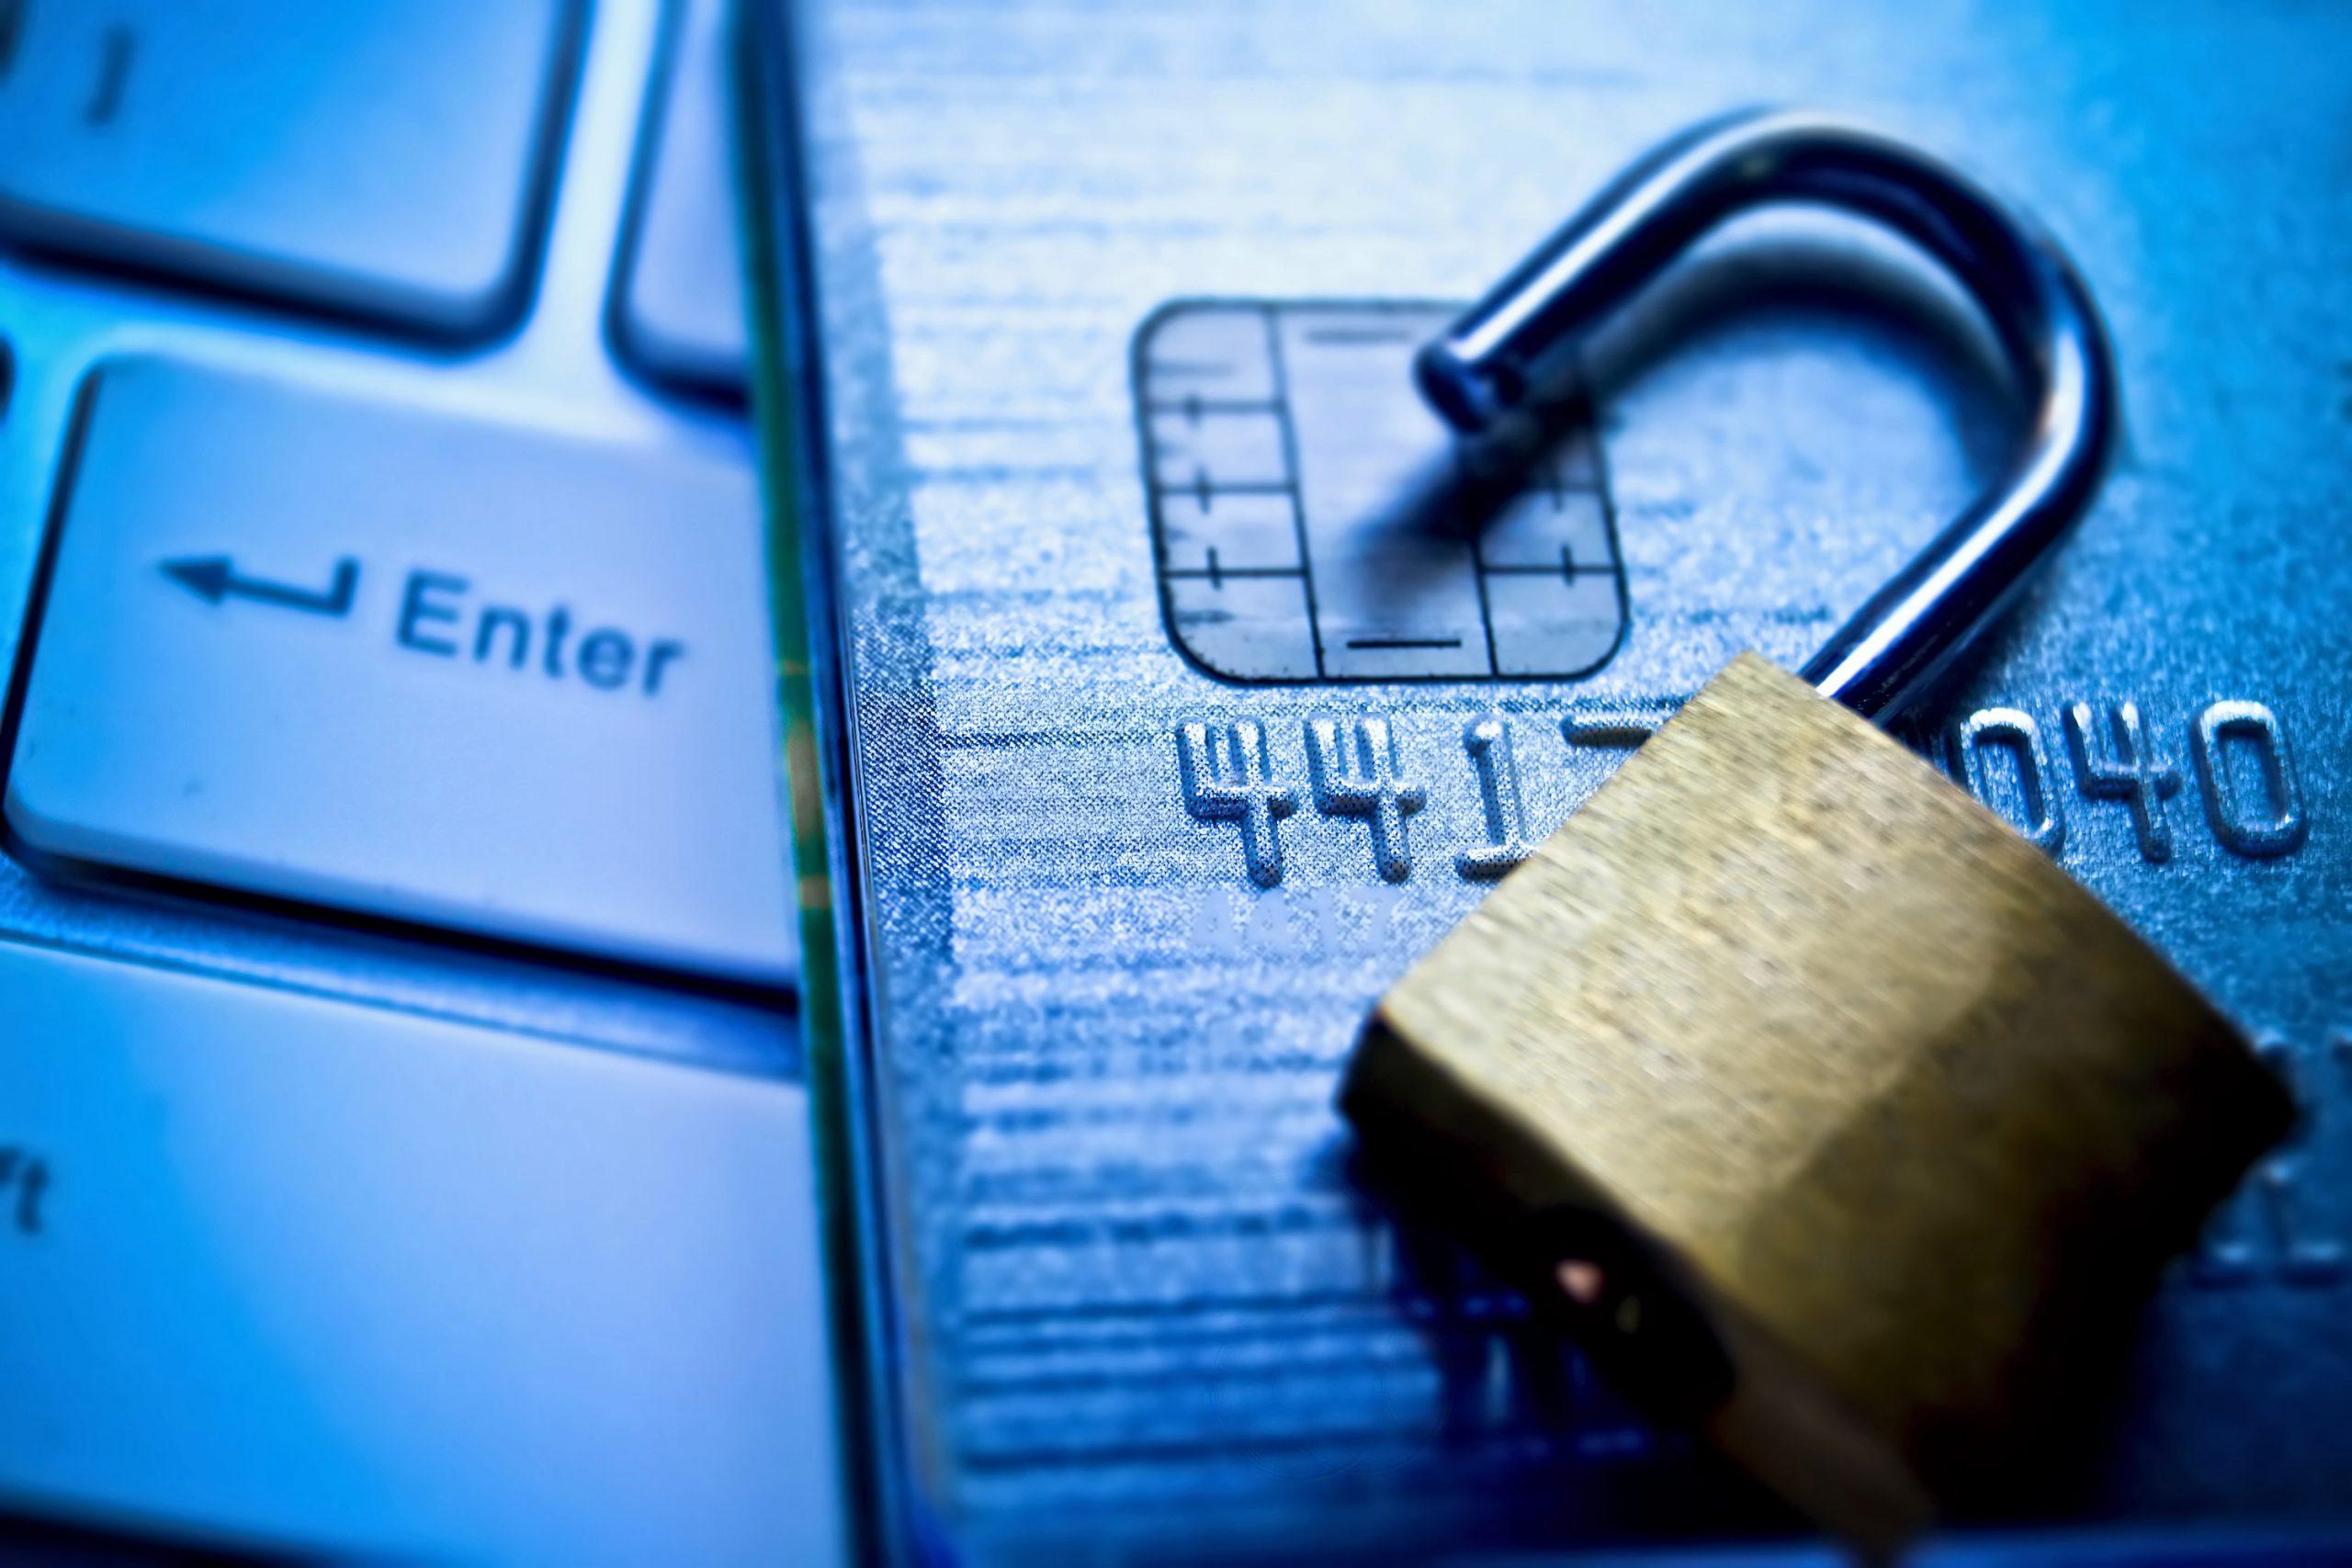 padlock on credit card